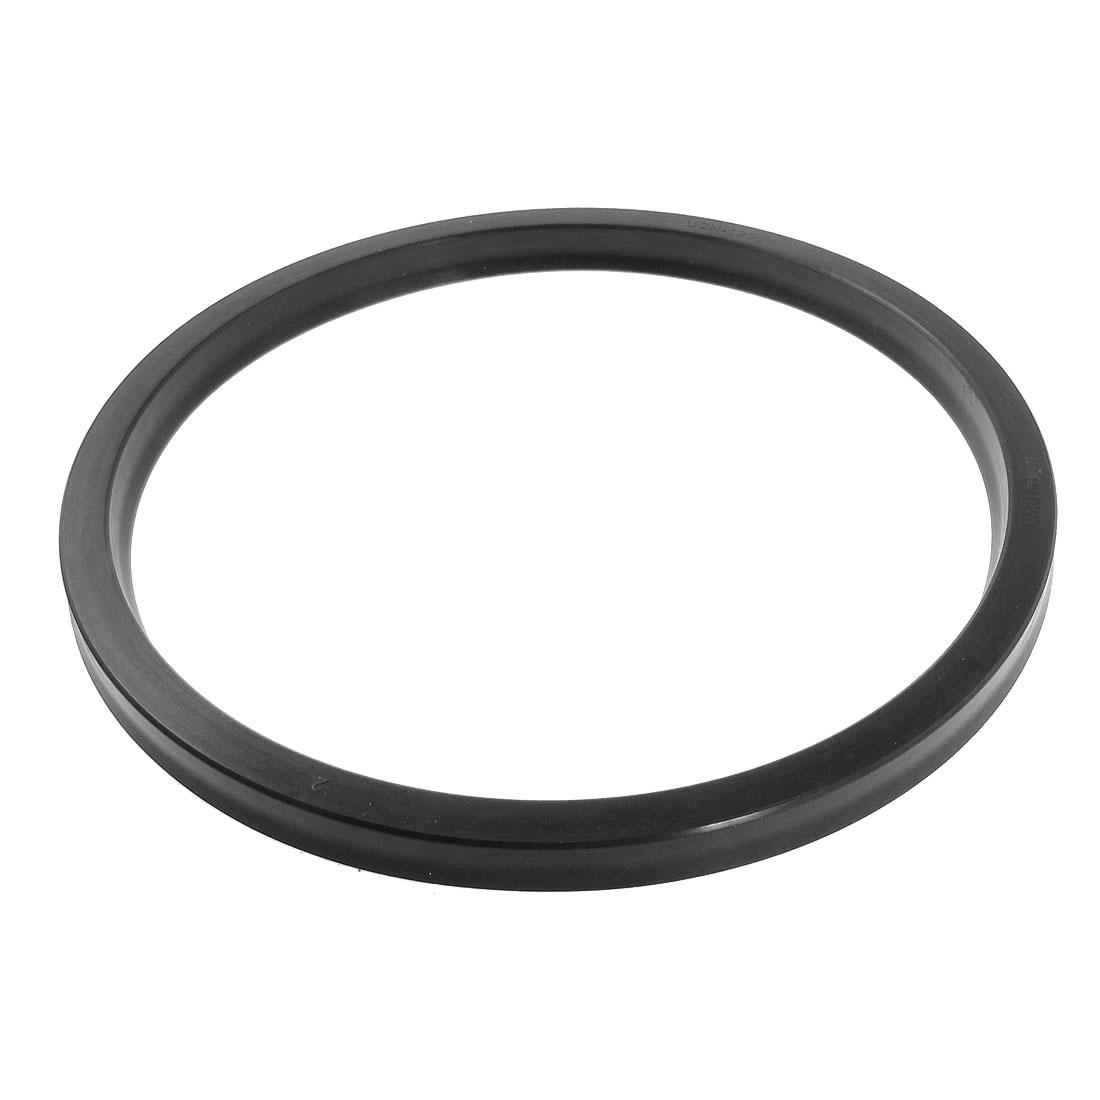 Mechanical USH 135 x 150 x 9mm Black Rubber Gasket Oil Seal